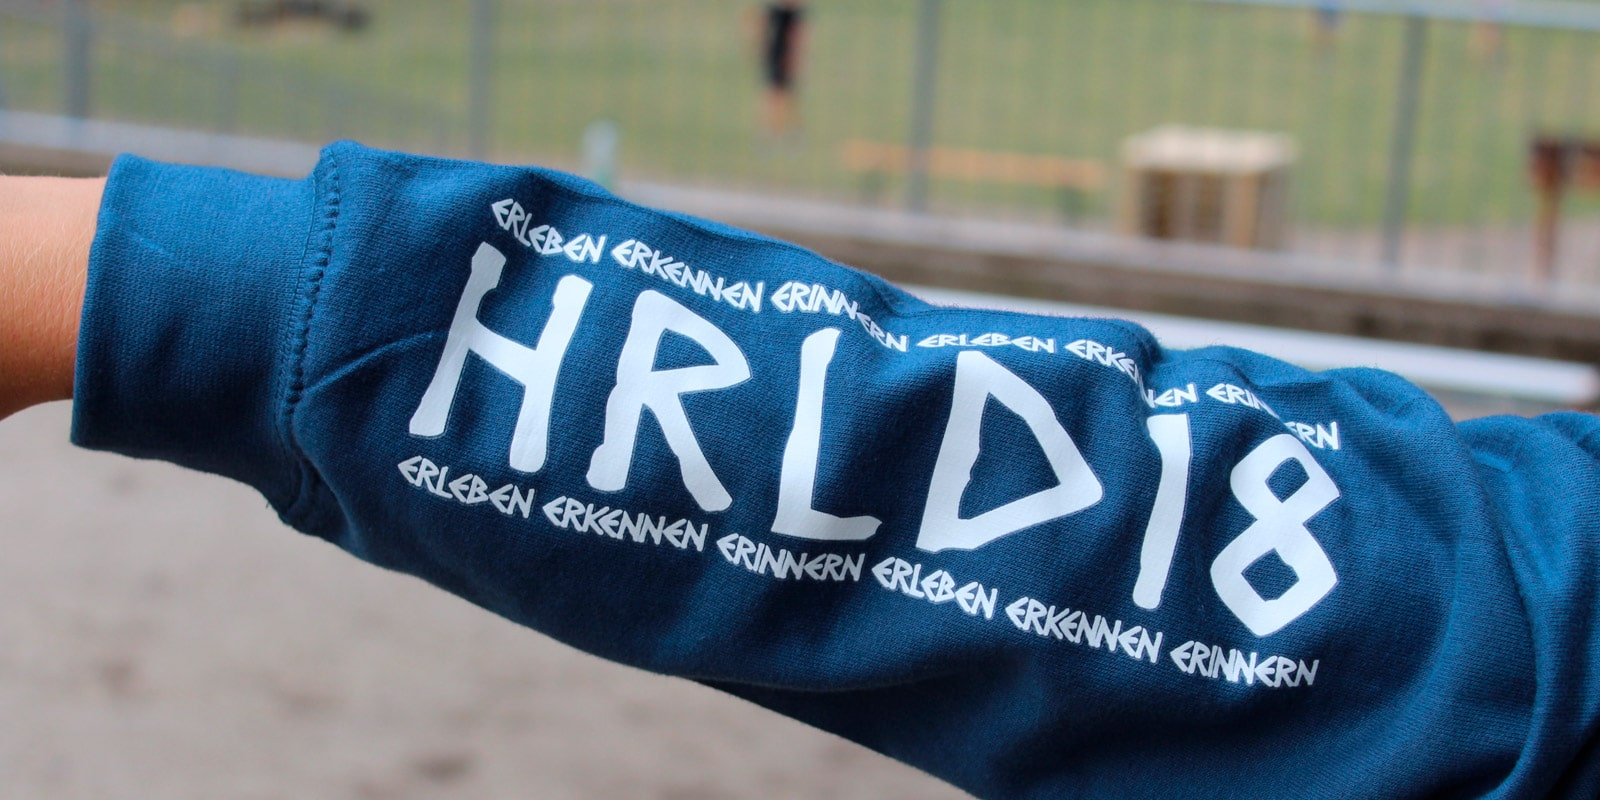 Herold Lager Bielefeld